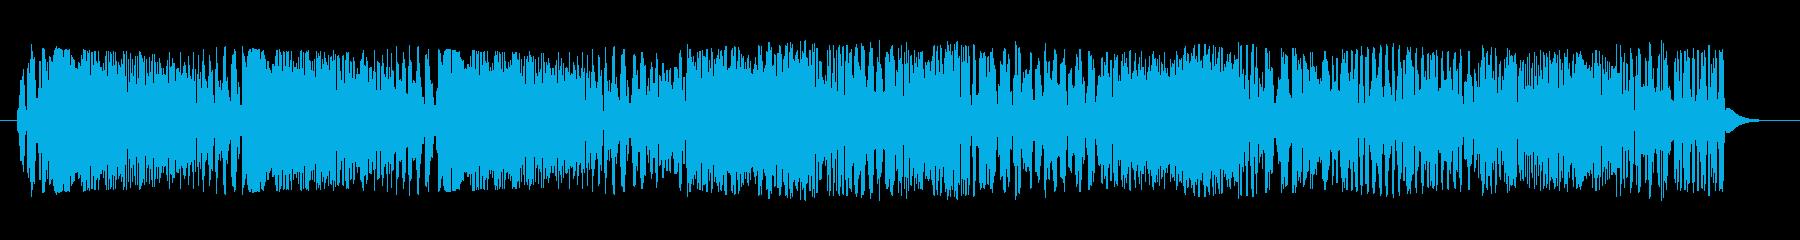 Electrozapperスワイプ1の再生済みの波形